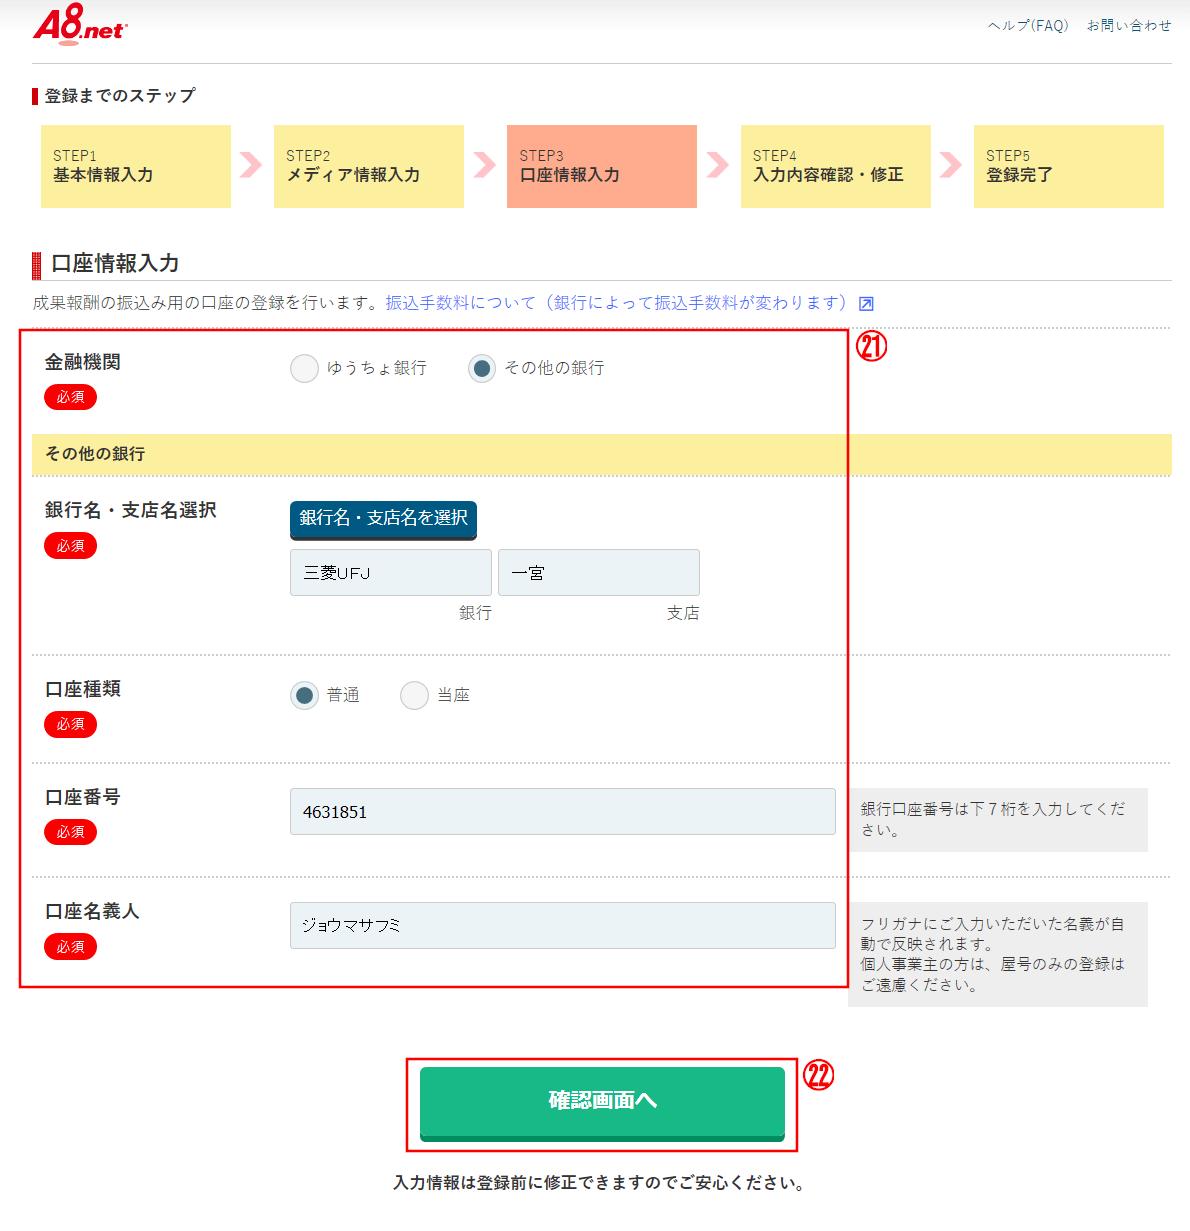 A8net無料会員登録修正版2 (3)